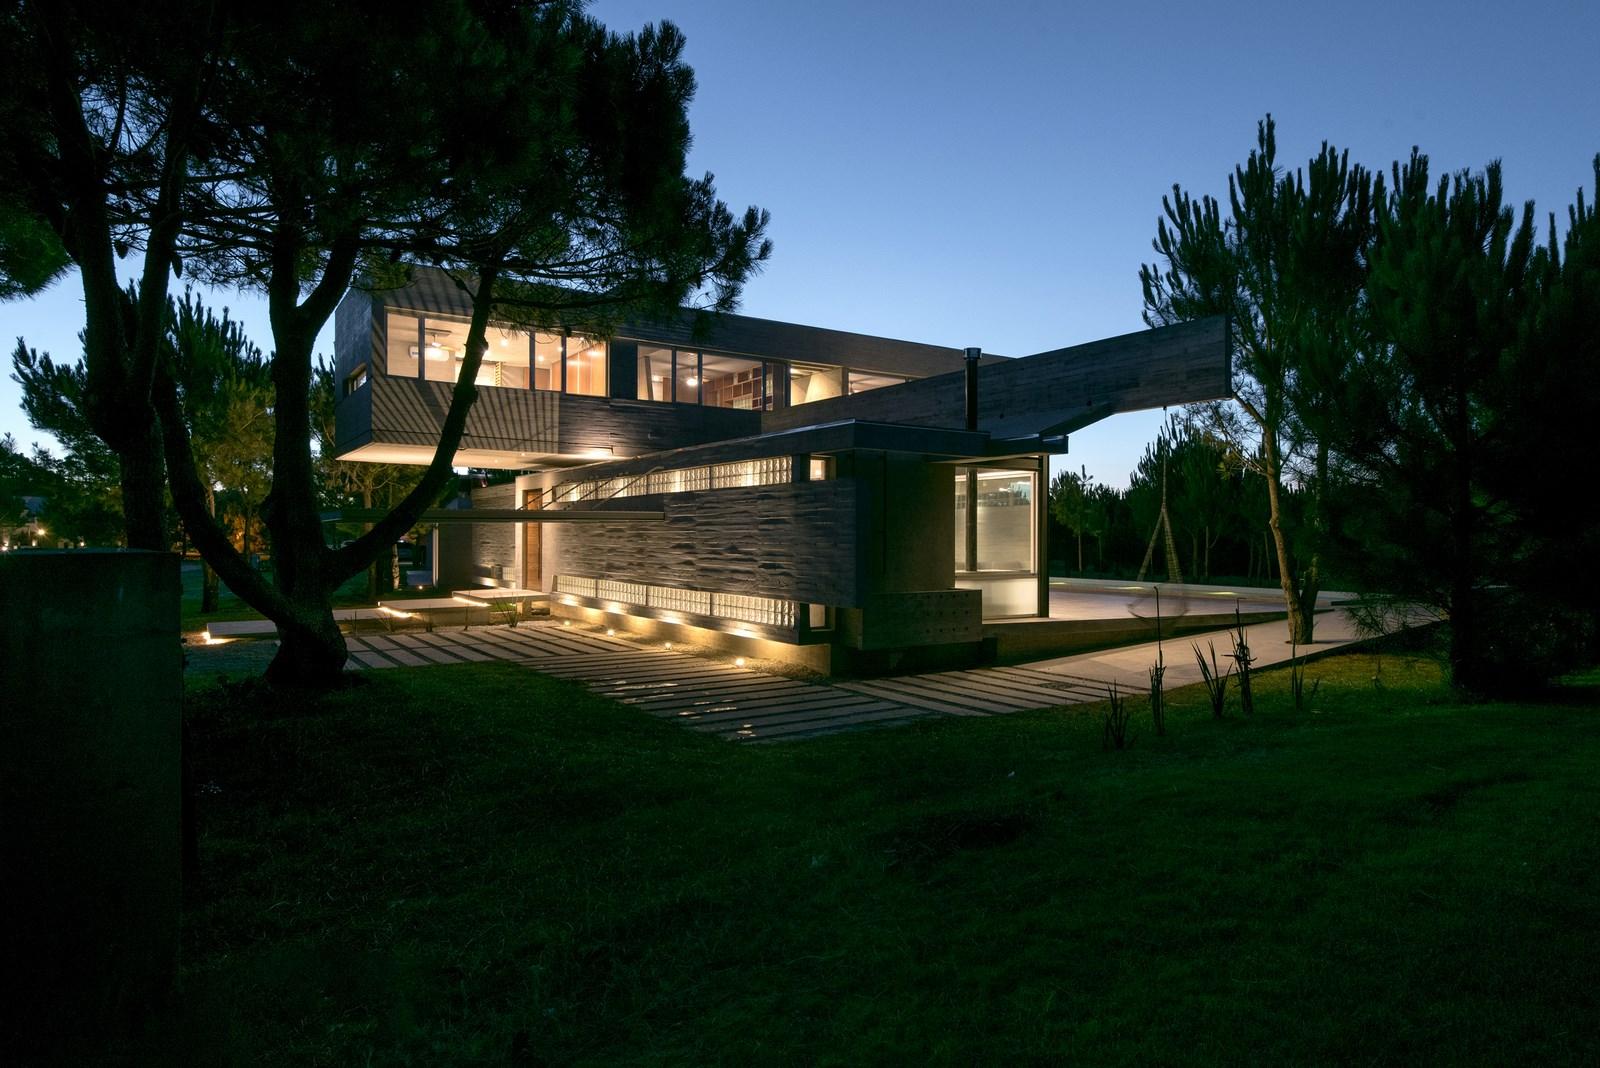 Casa AYYA - Estudio Galera - Foto © Diego Medina 136 (Copy)